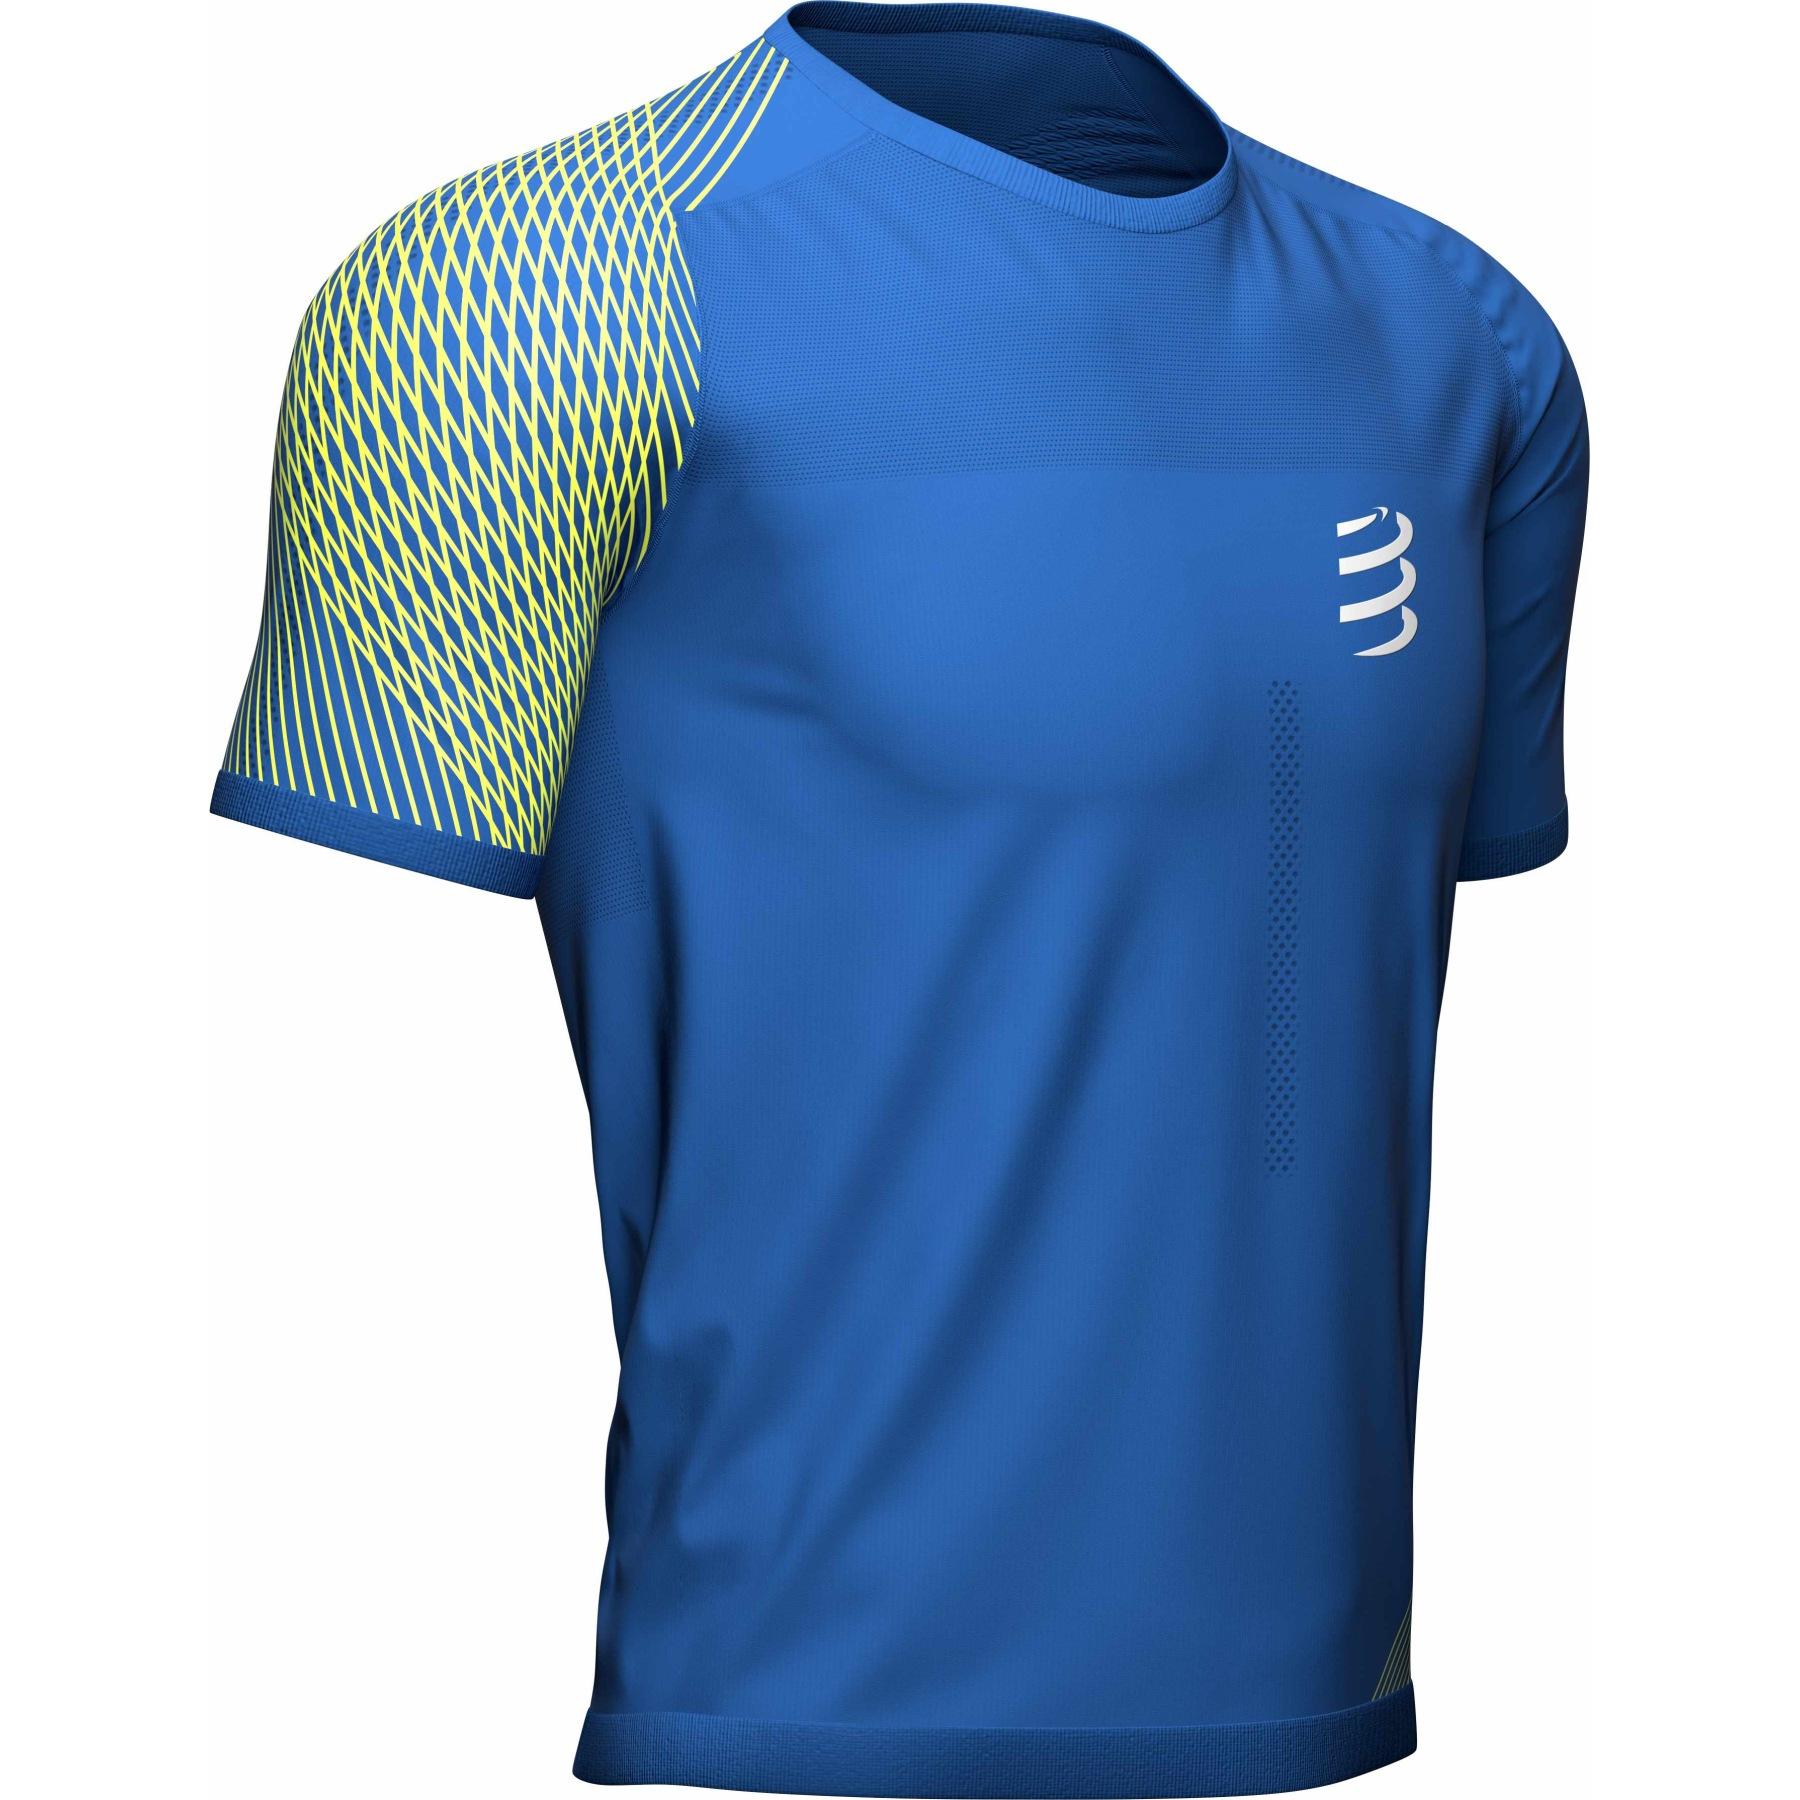 Foto de Compressport Performance Camiseta de running - blue lolite